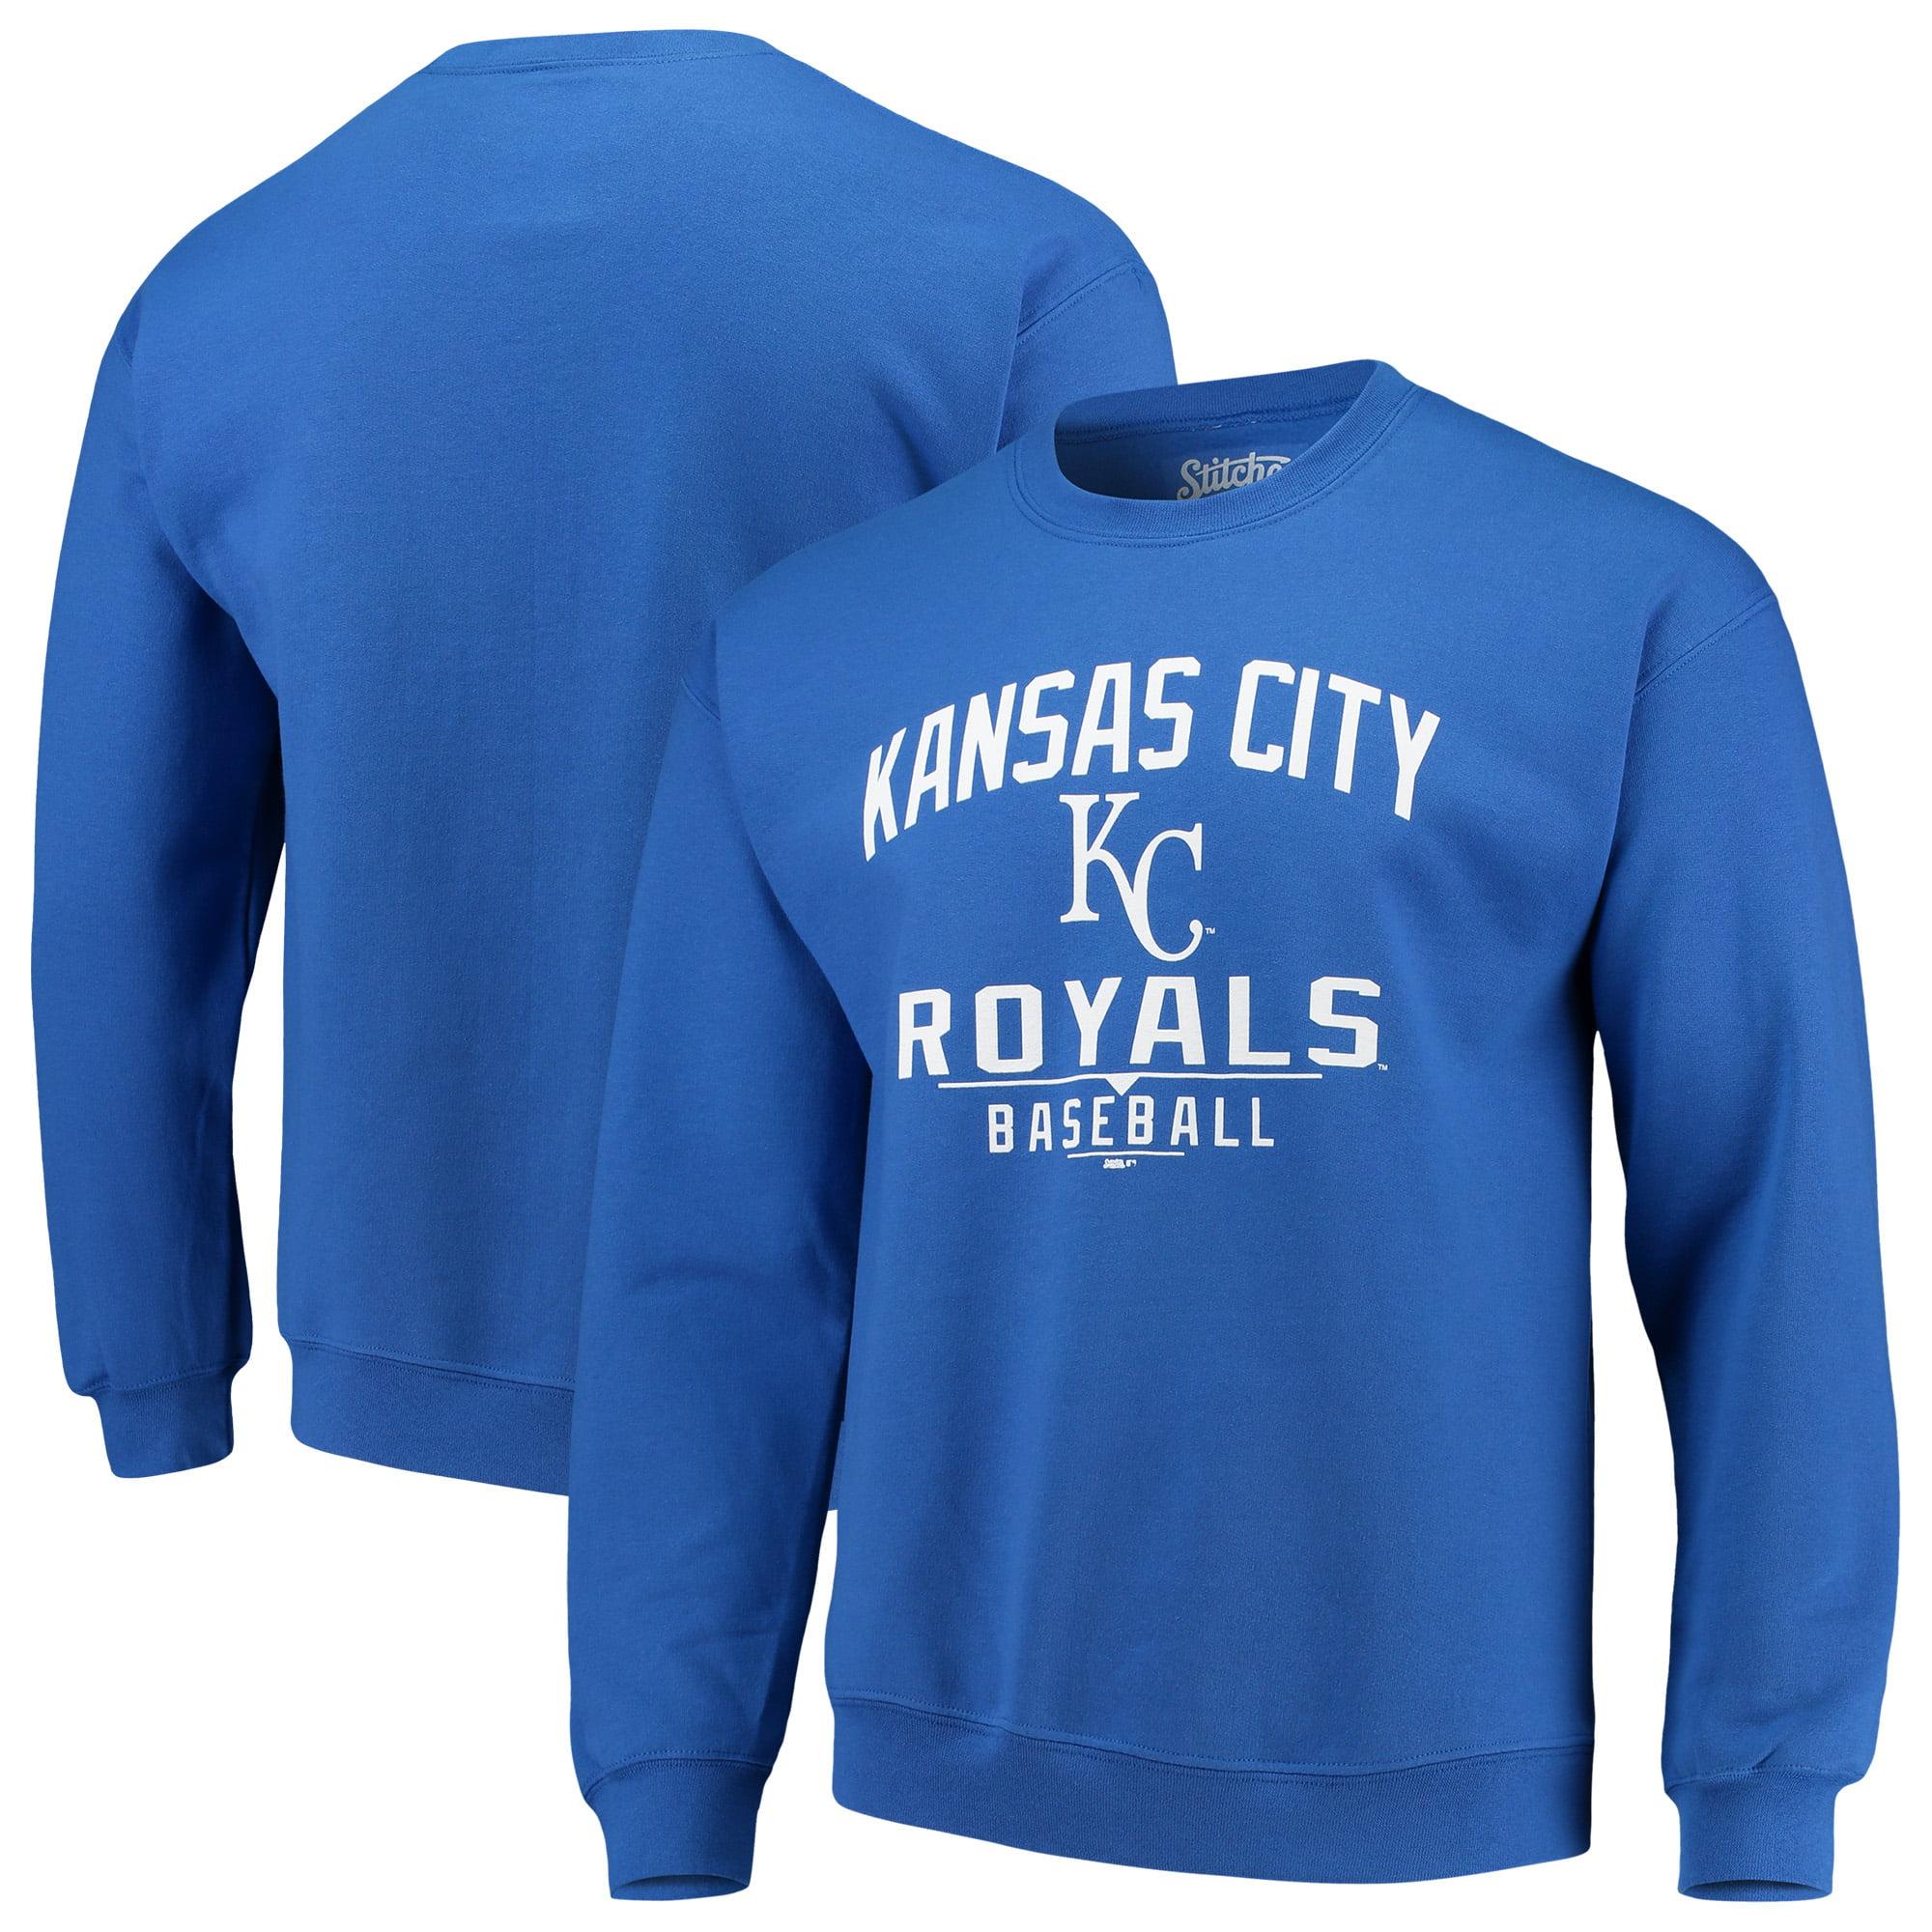 Kansas City Royals Stitches Holiday Pullover Crew Sweatshirt - Royal